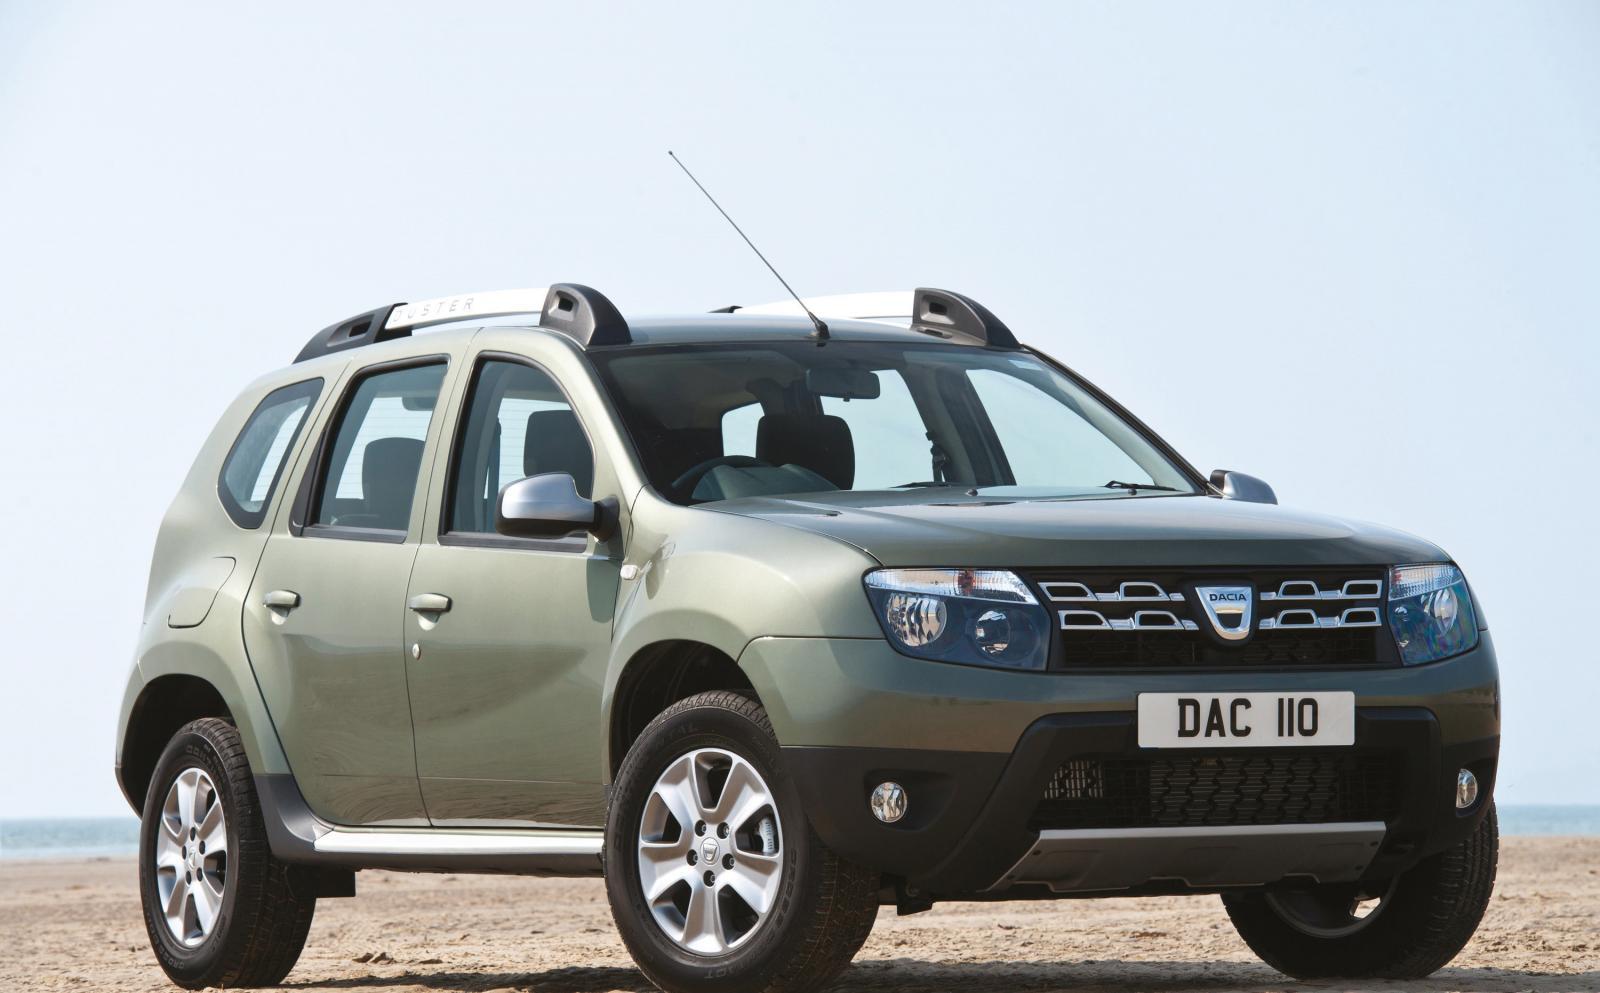 Dacia Duster 1.6 Euro 6 01